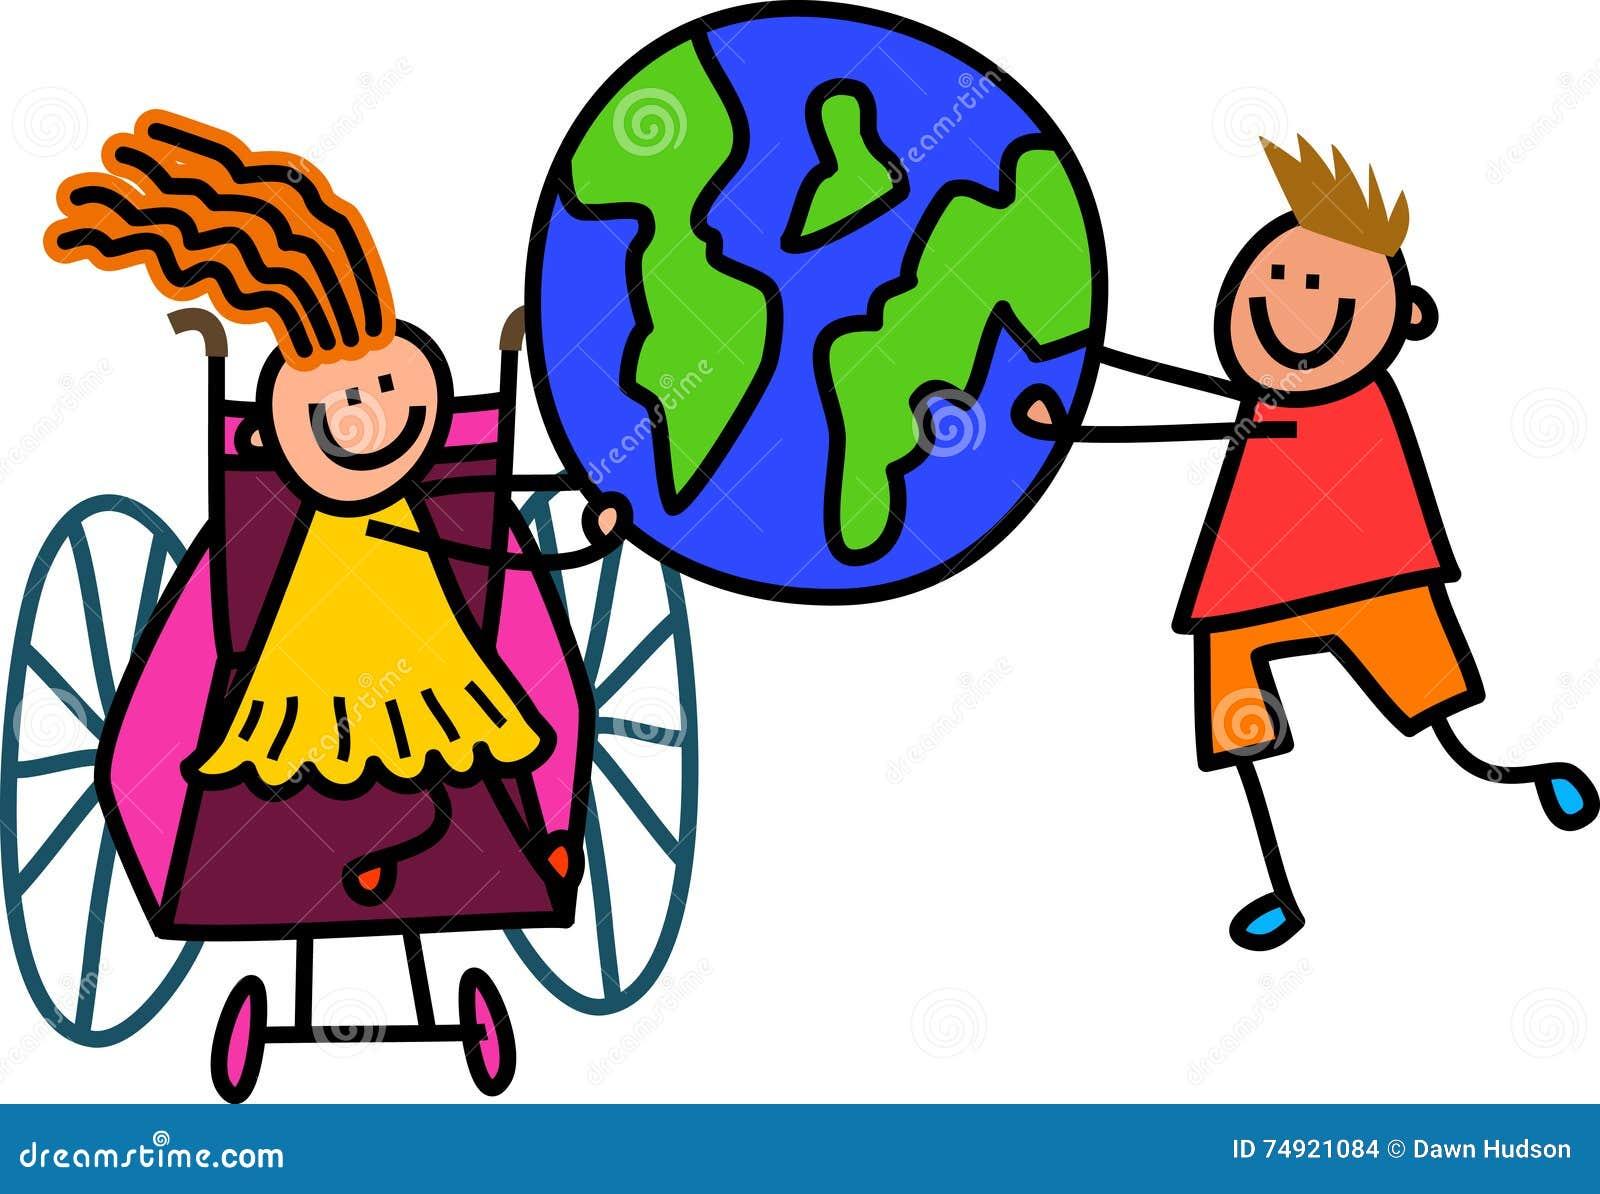 Disabled World Kids Stock Illustration - Image: 74921084